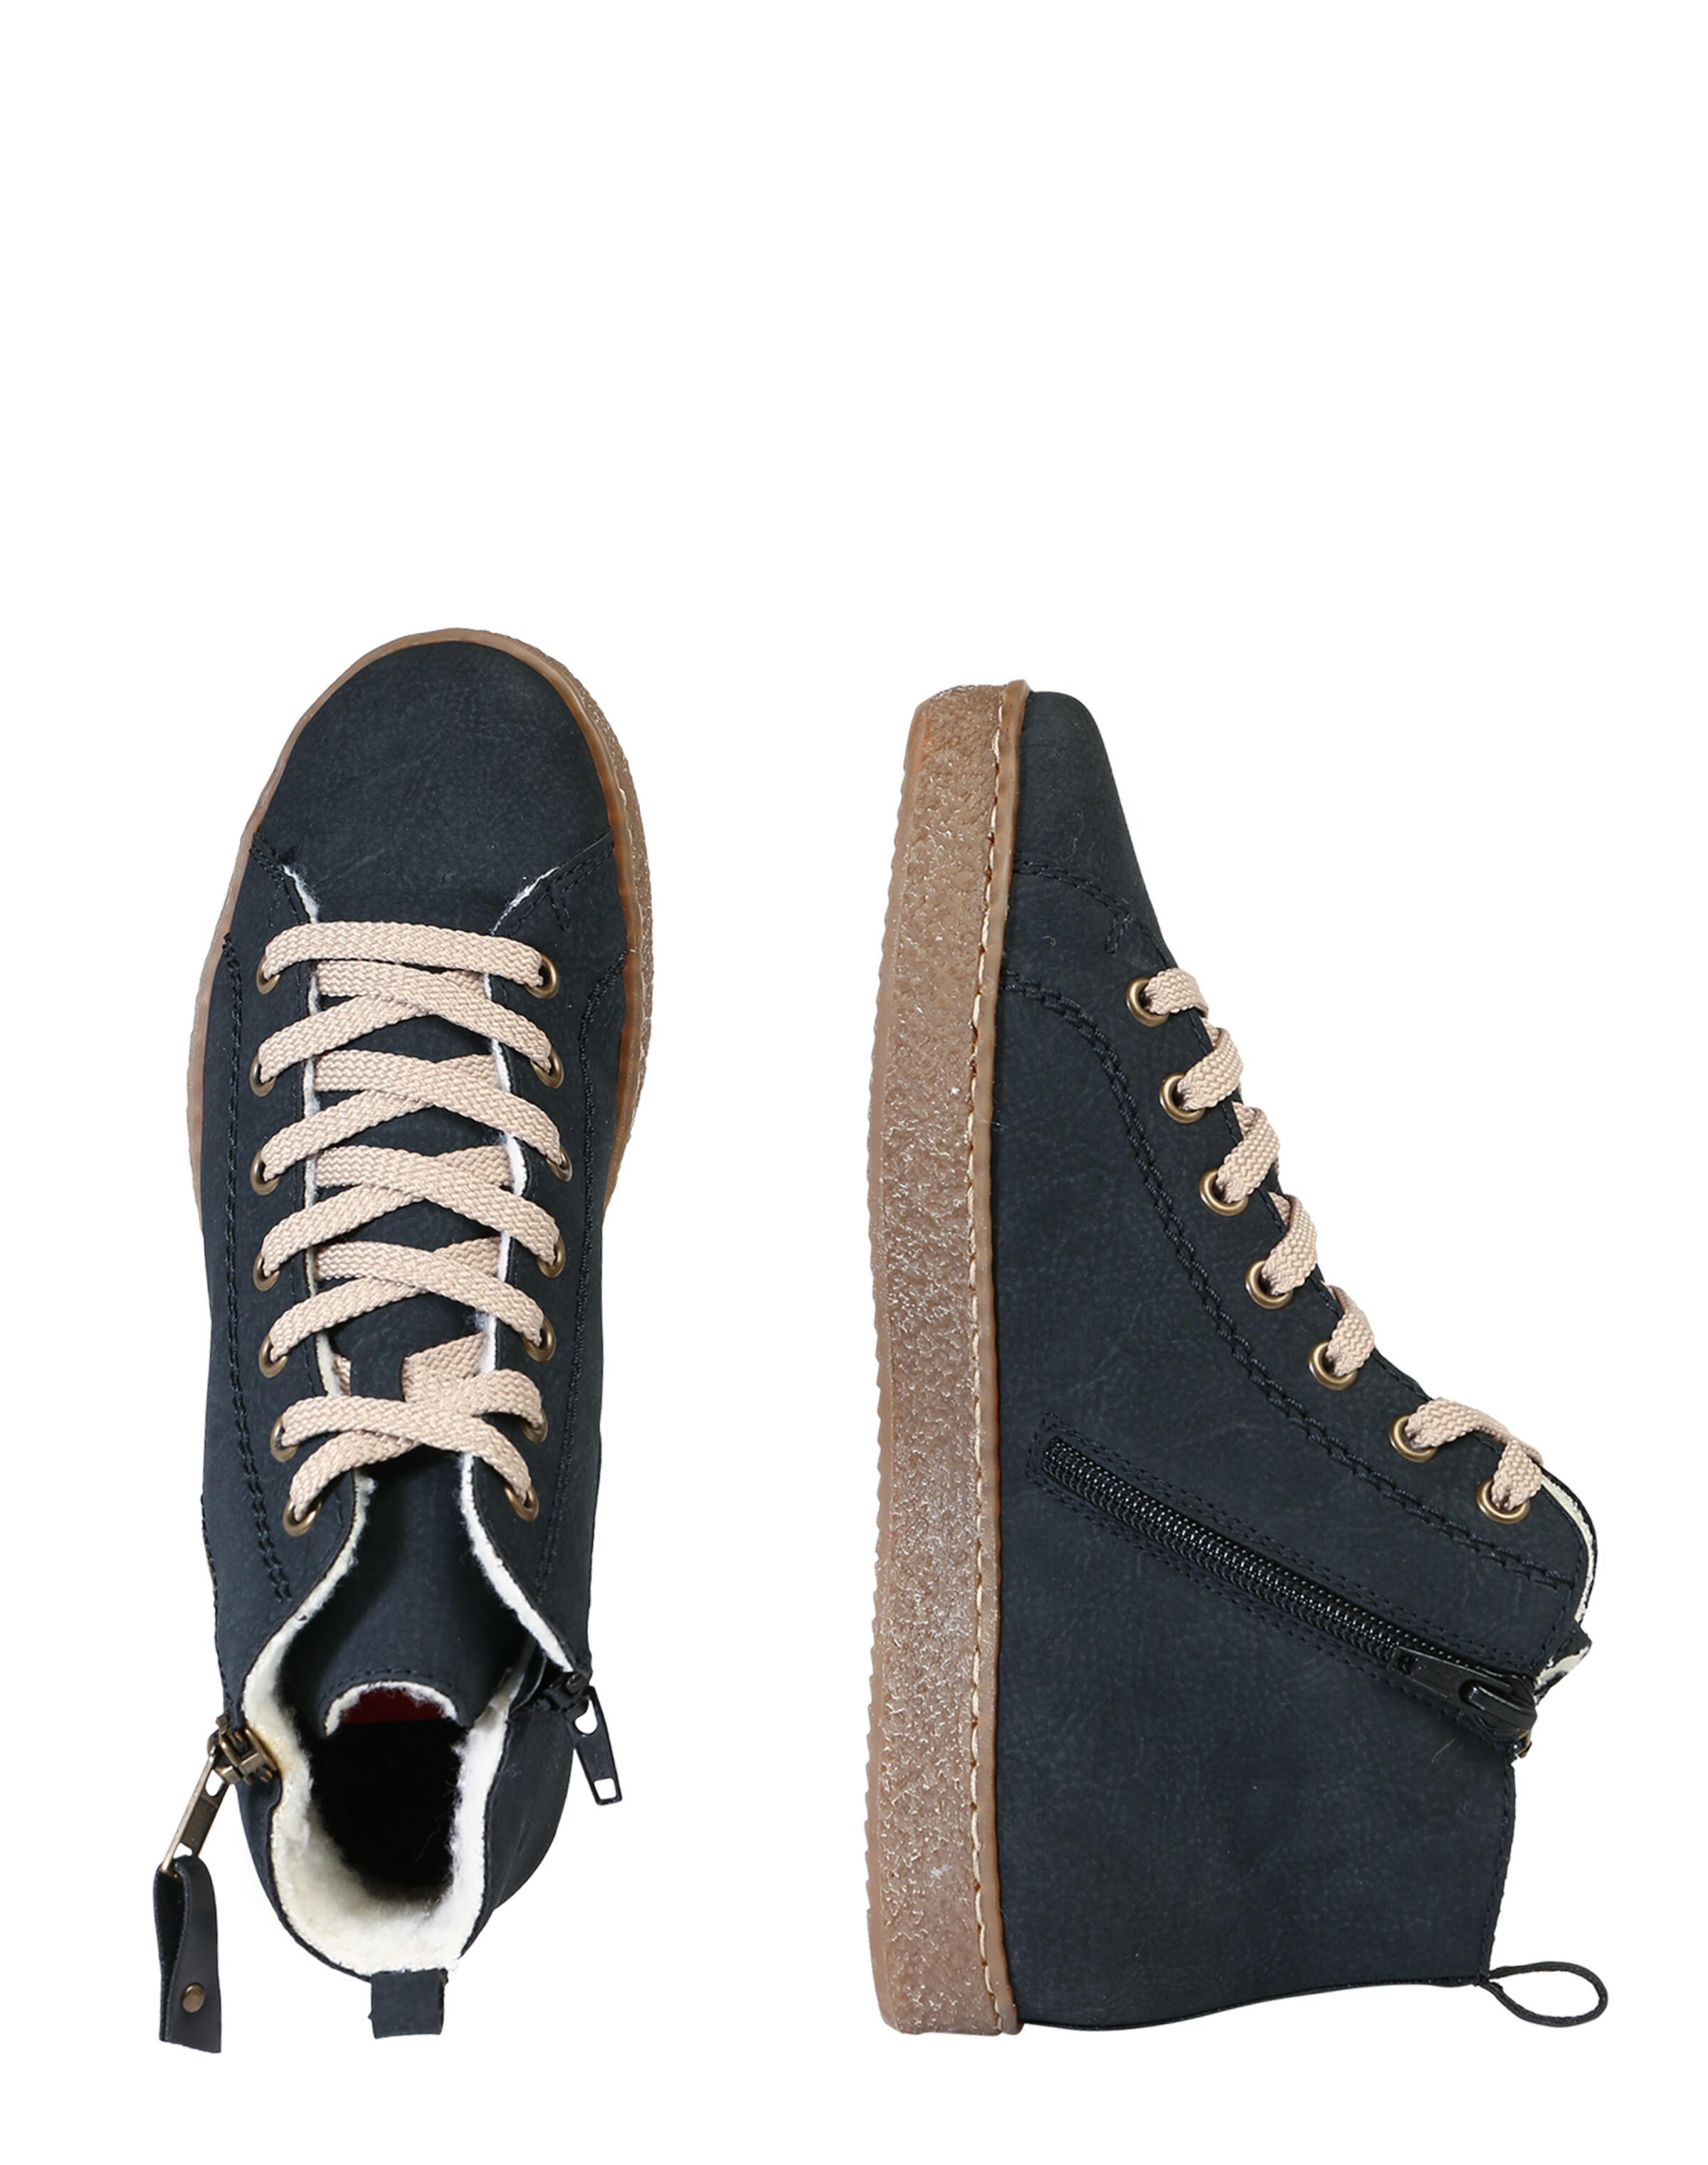 RIEKER Sneaker High in Leder-Optik Rabatt Echt Spielraum Store lMd9RE